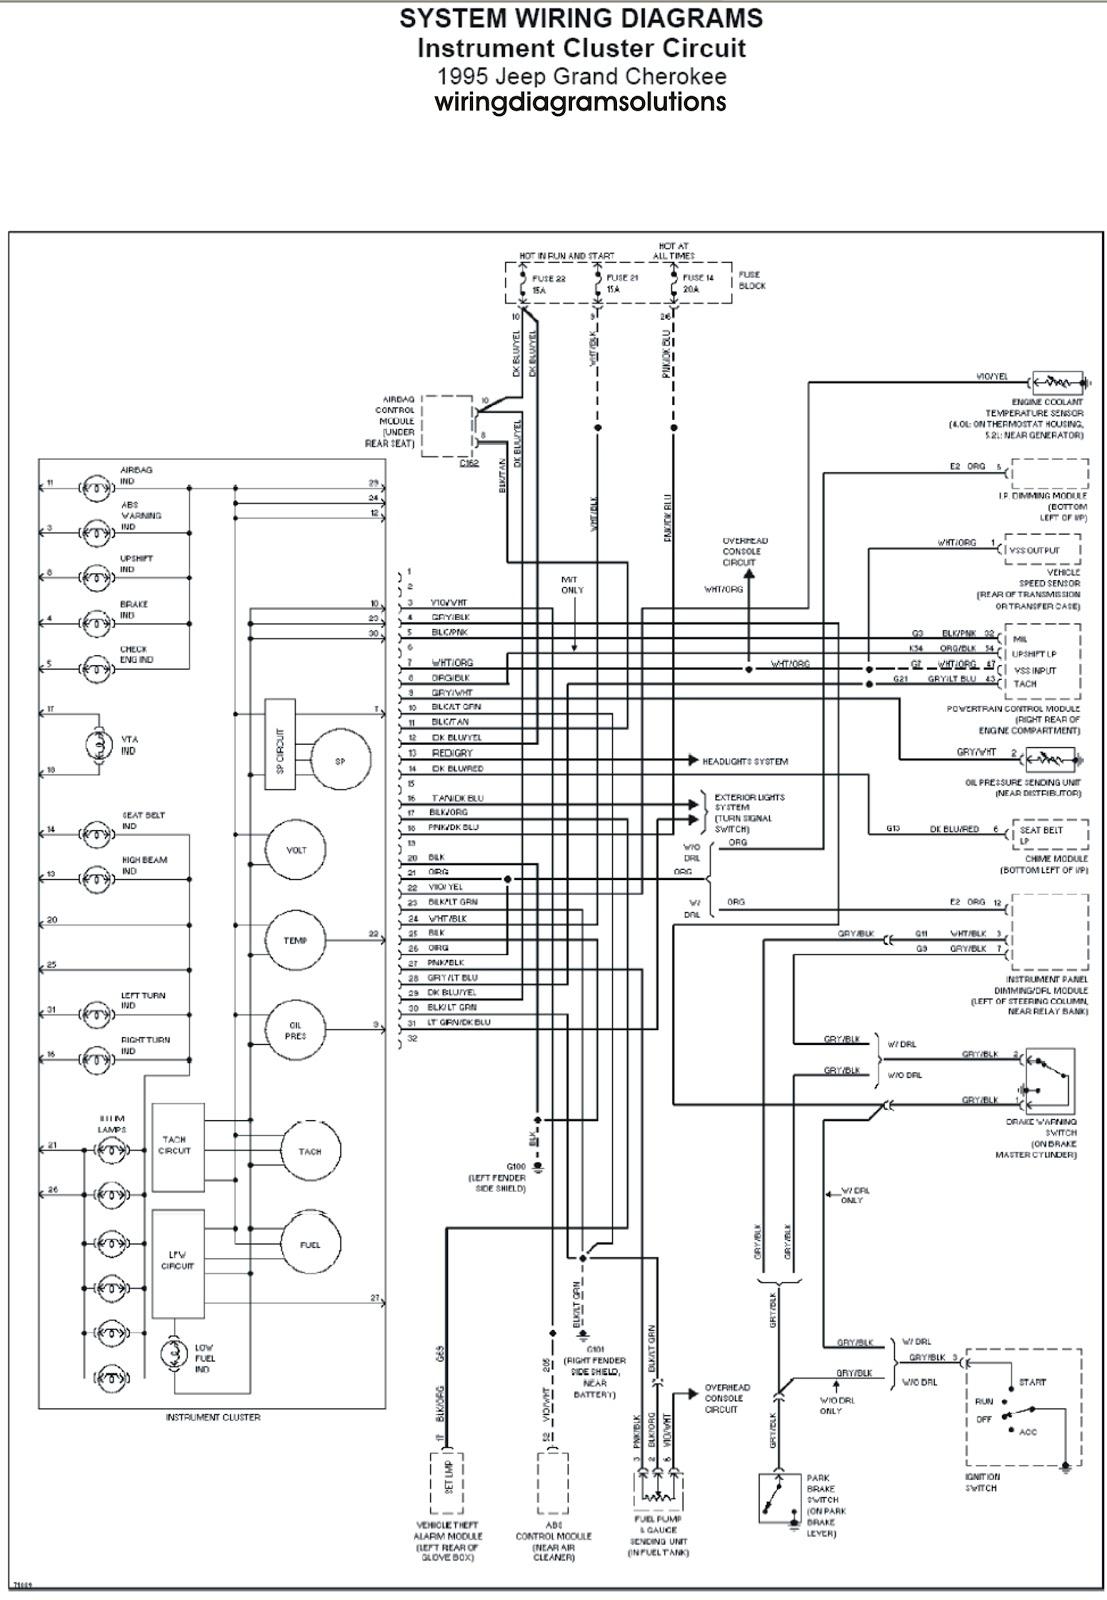 Corn Pro Wiring Diagram - seniorsclub.it wires-mouth - wires -mouth.hazzart.itHazzart